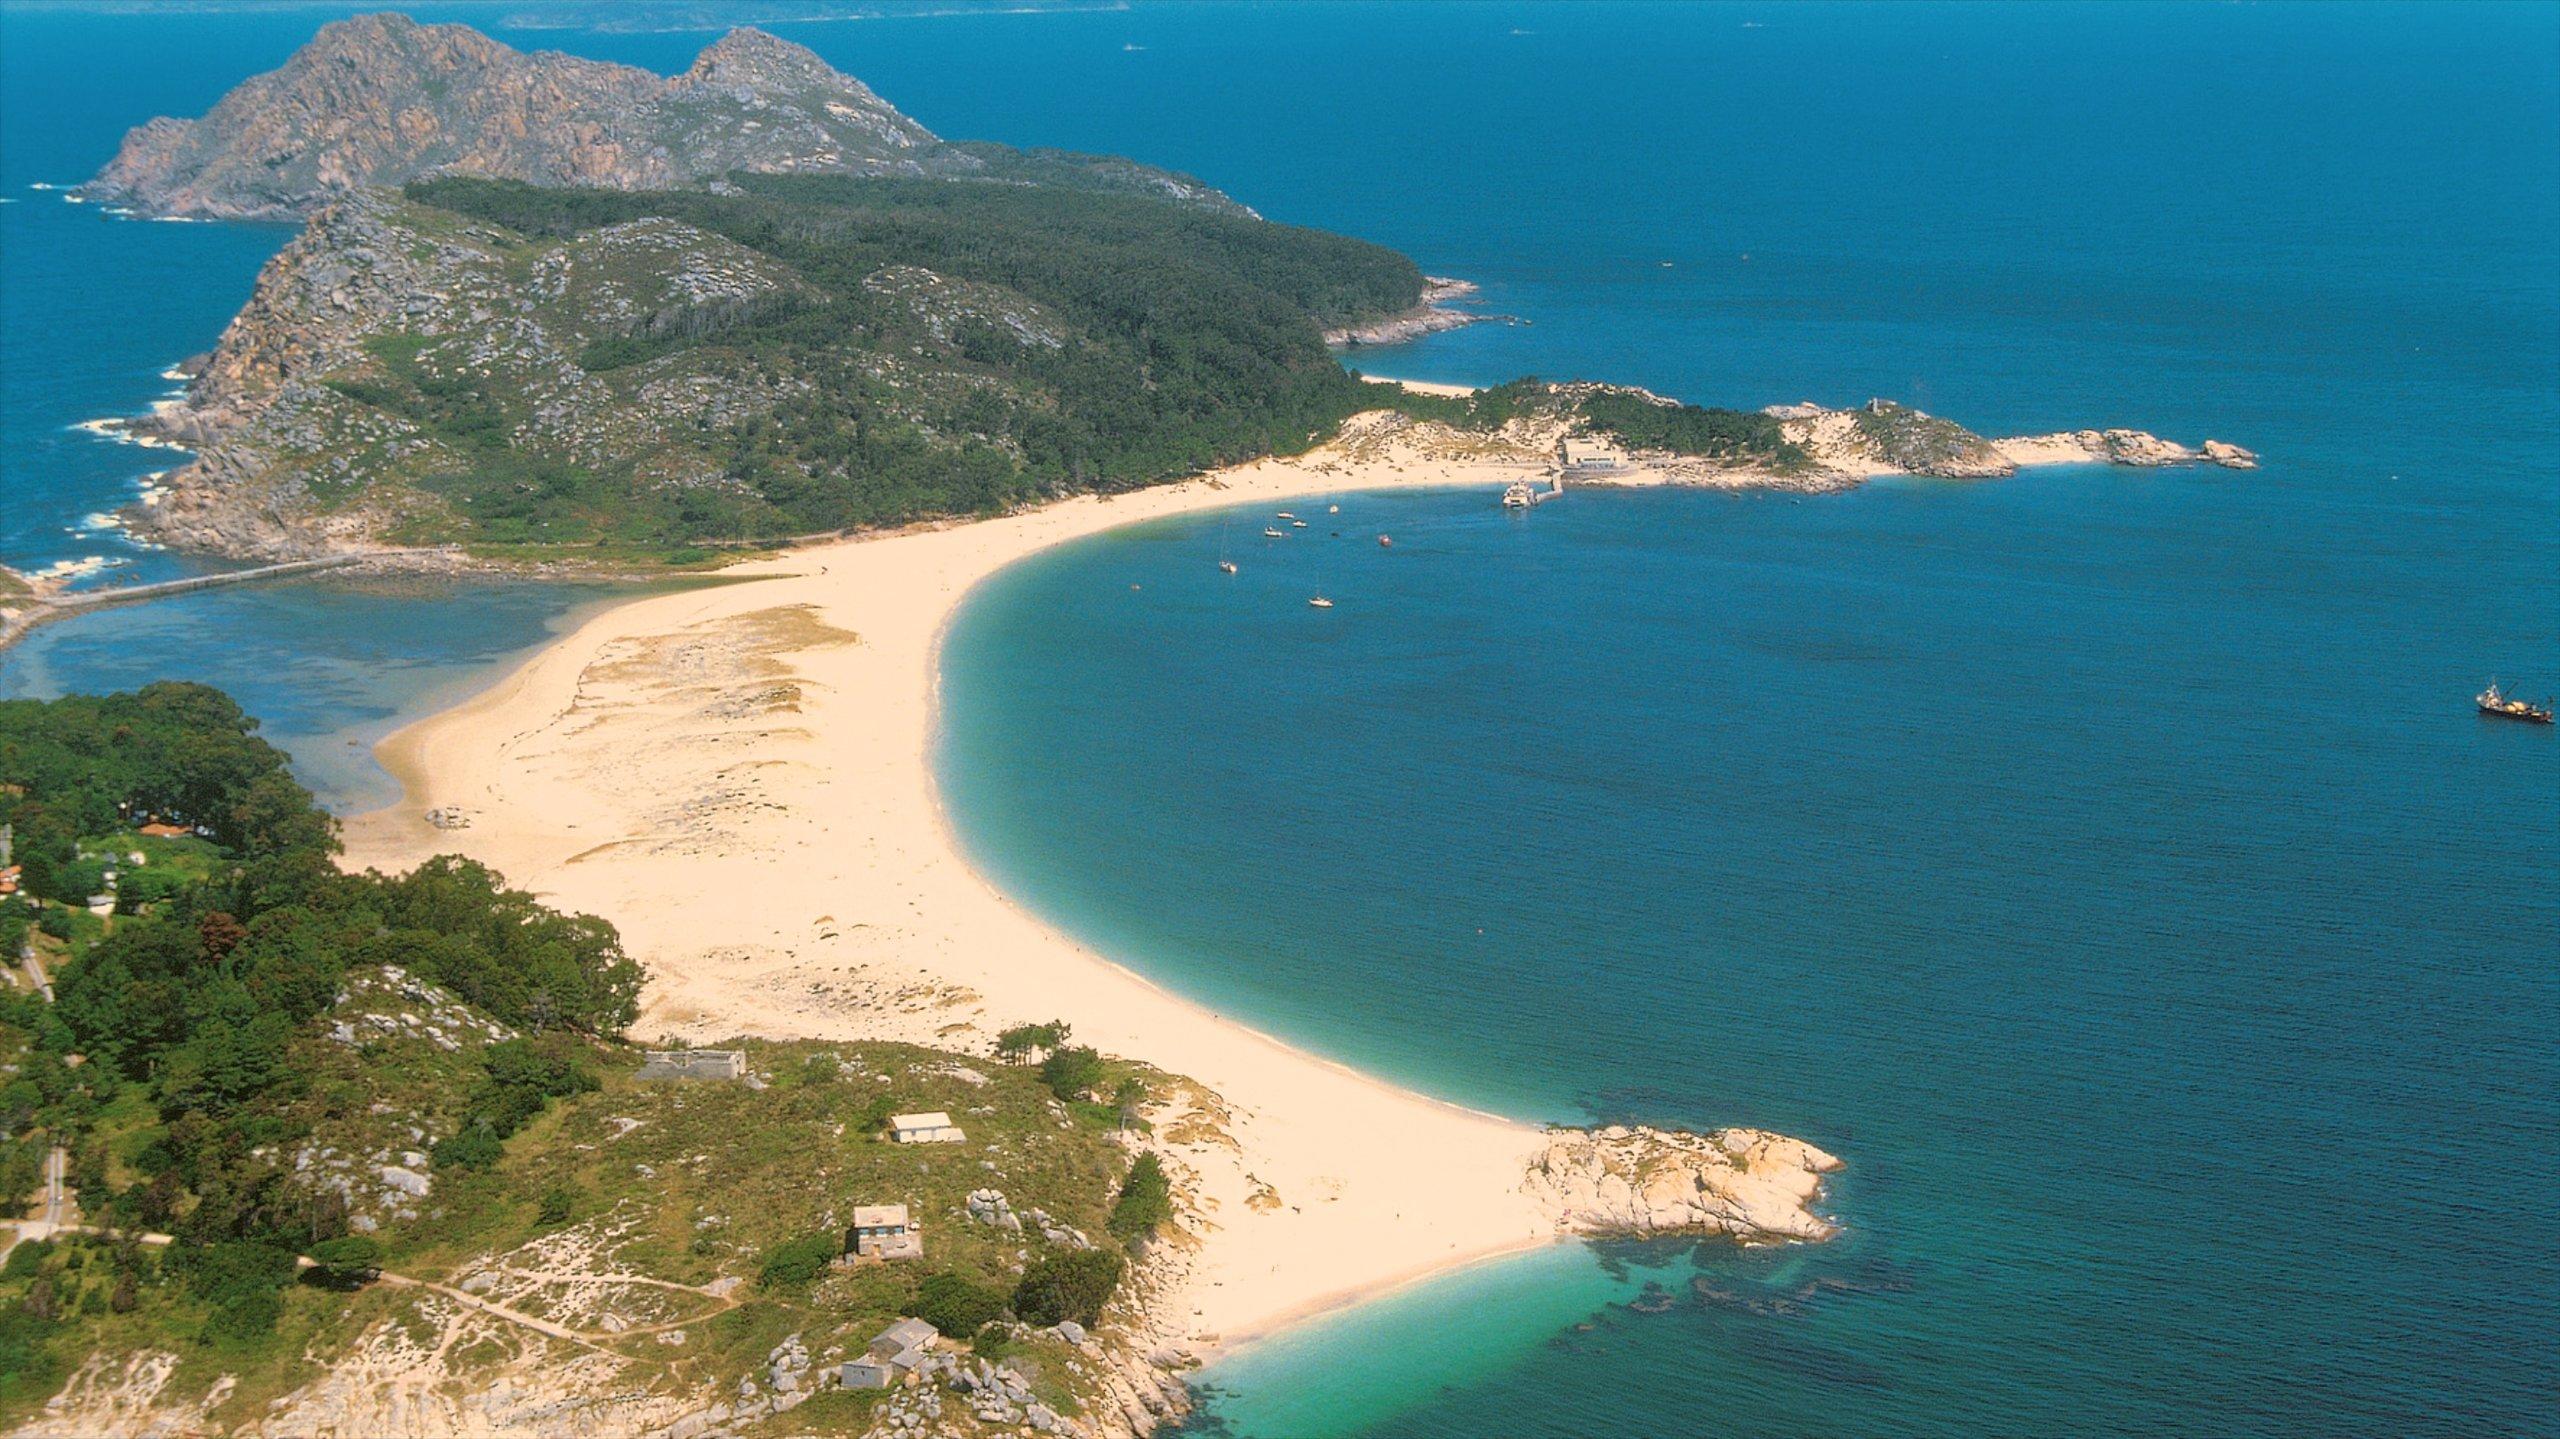 Pontevedra Province, Galicia, Spain